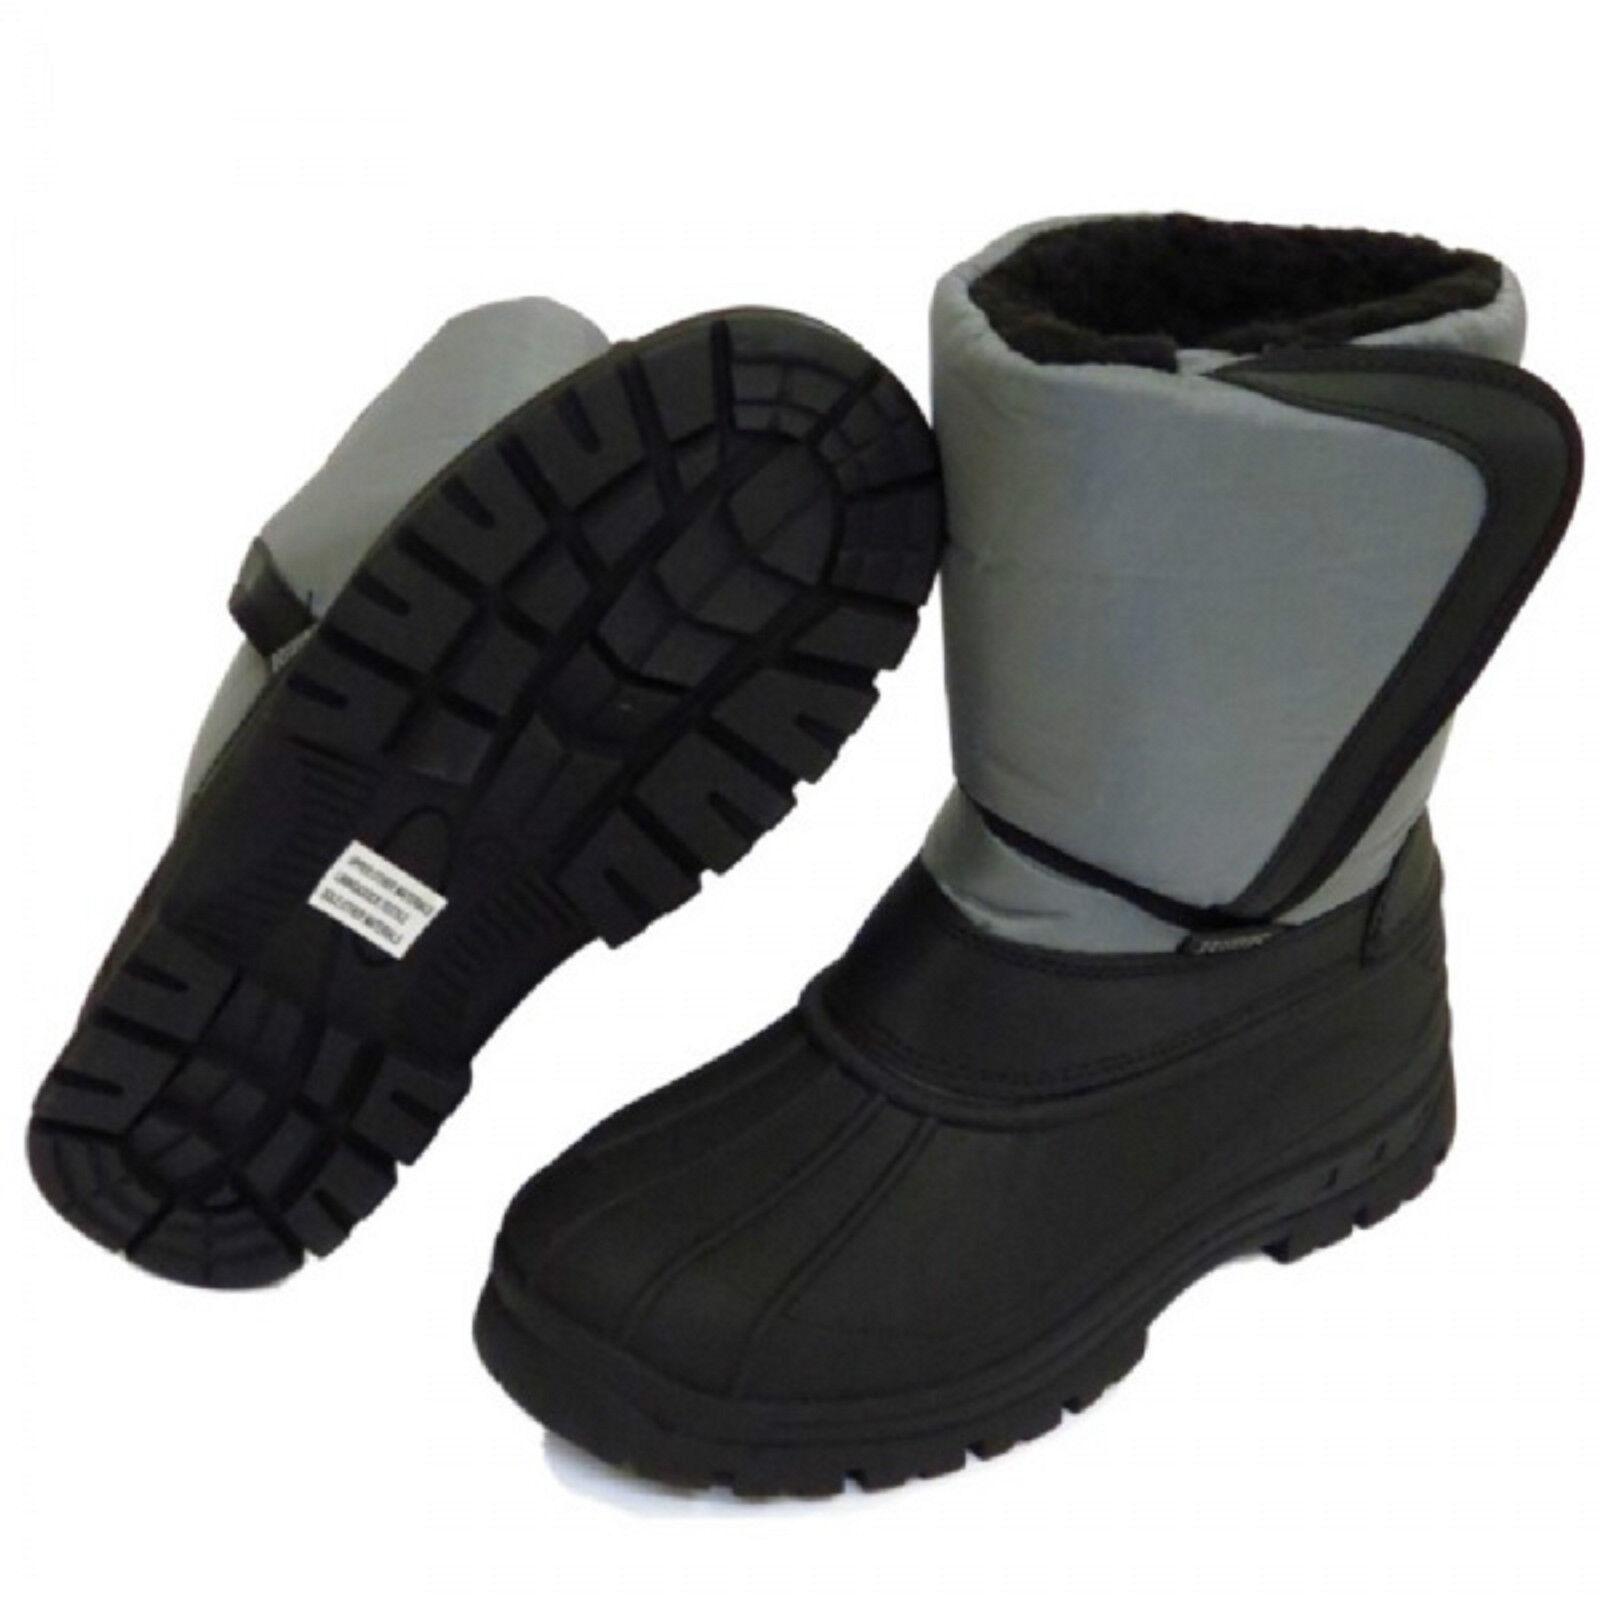 Ladies Black Grey Strap Slip-On Warm Winter Snow Boots Women Sizes UK 3-8